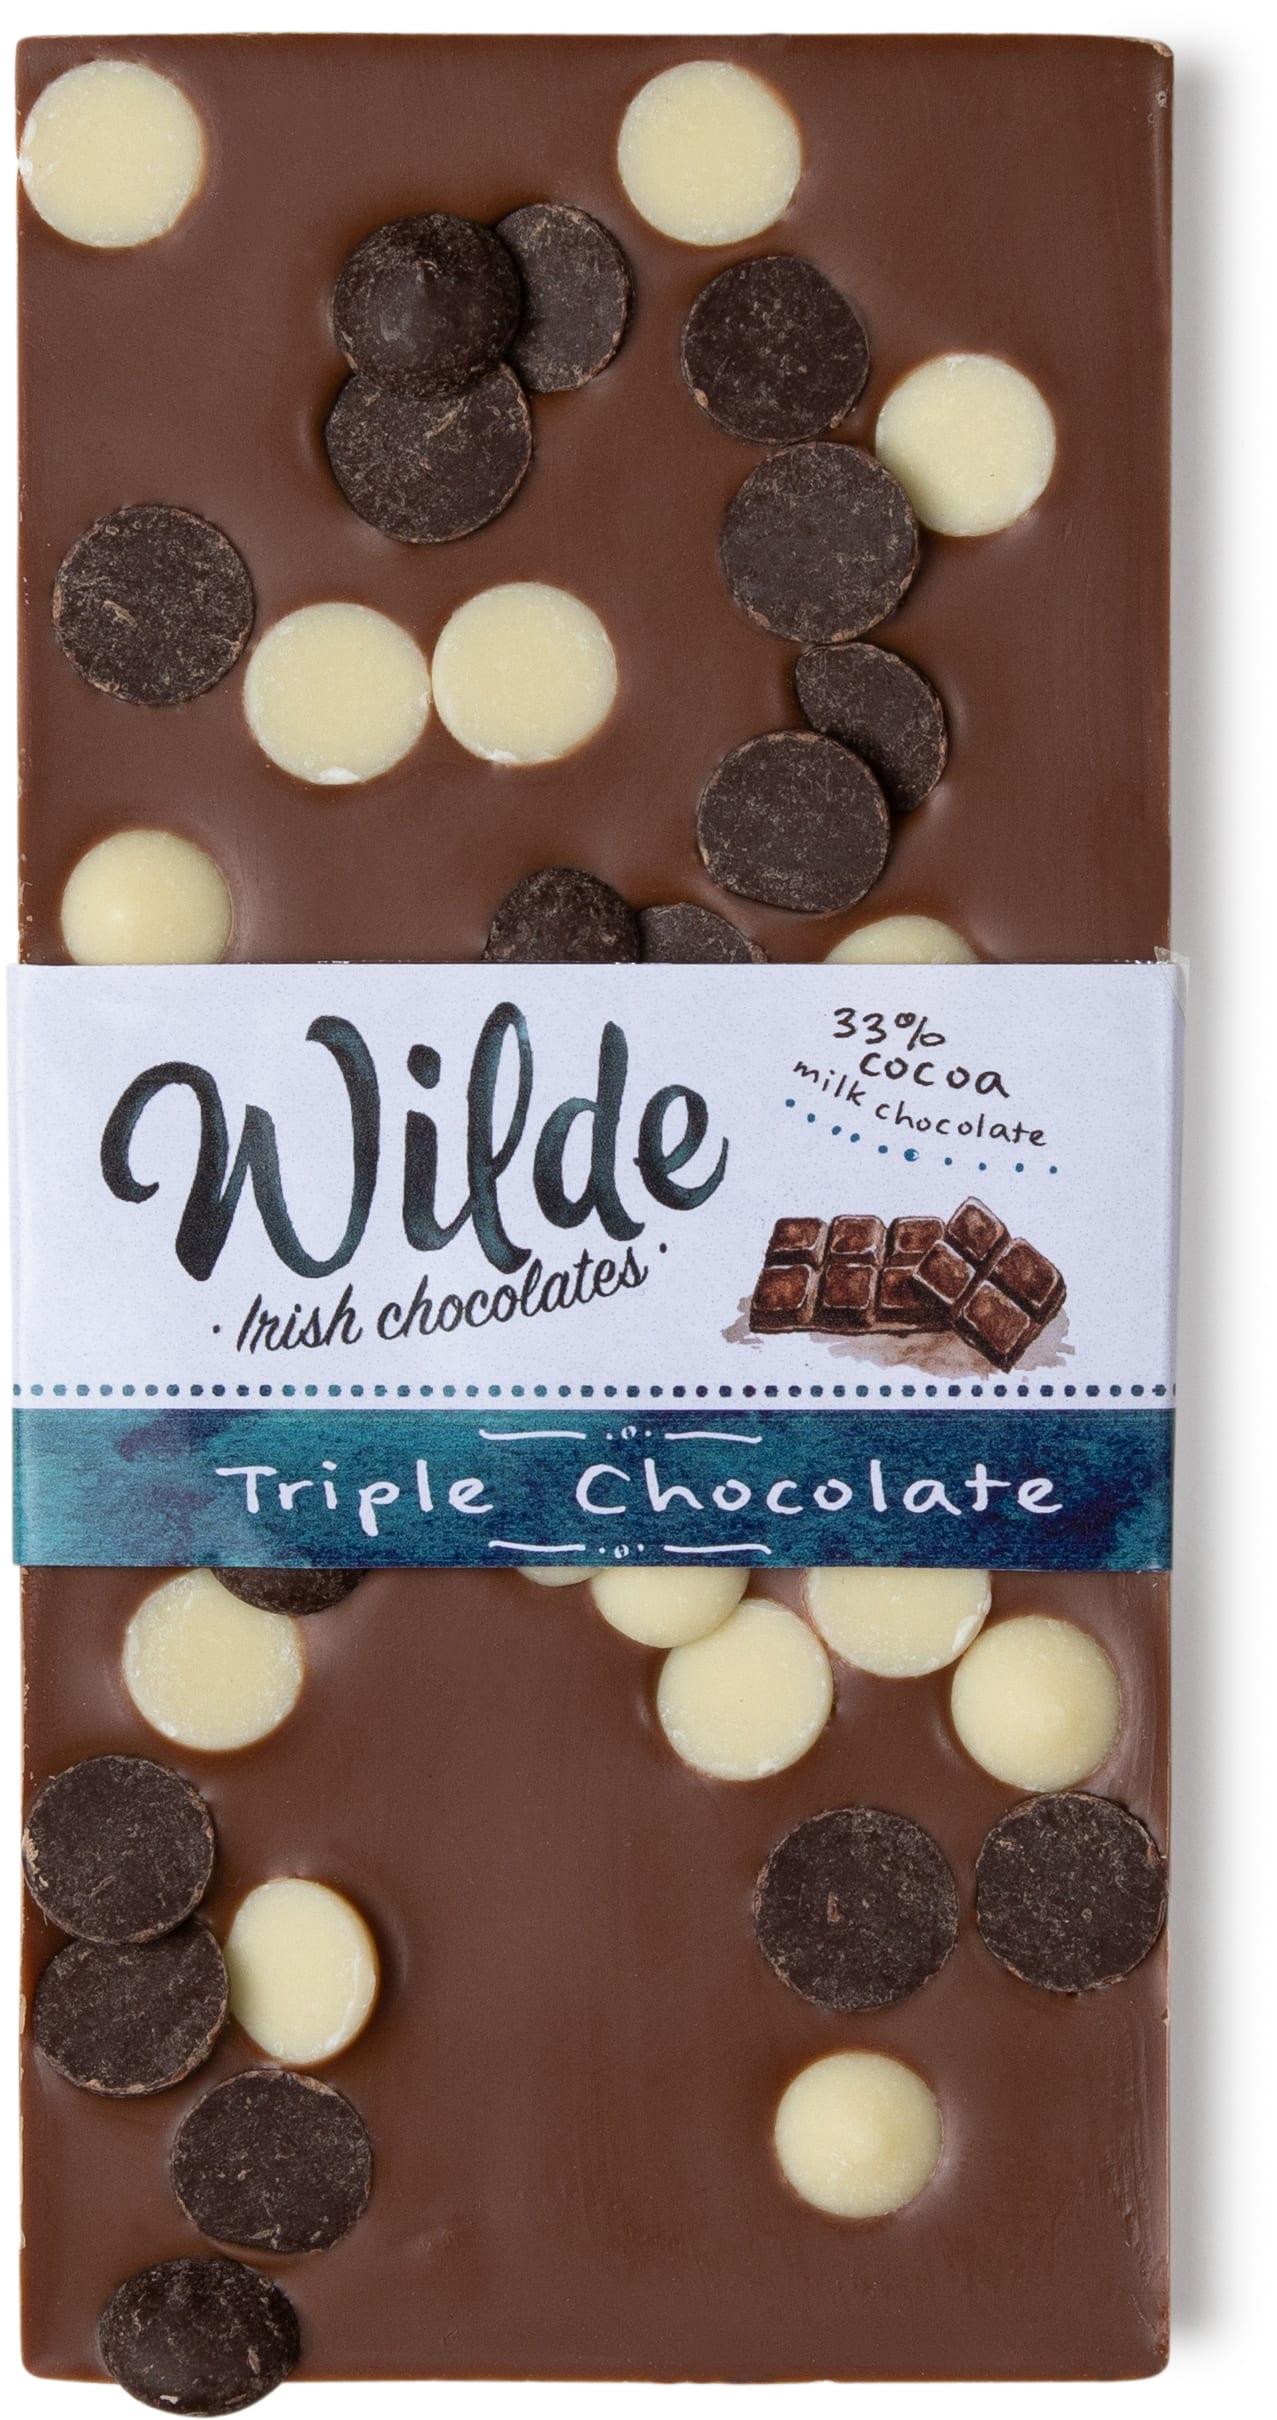 Triple chocolate bar - Wilde Irish Chocolates